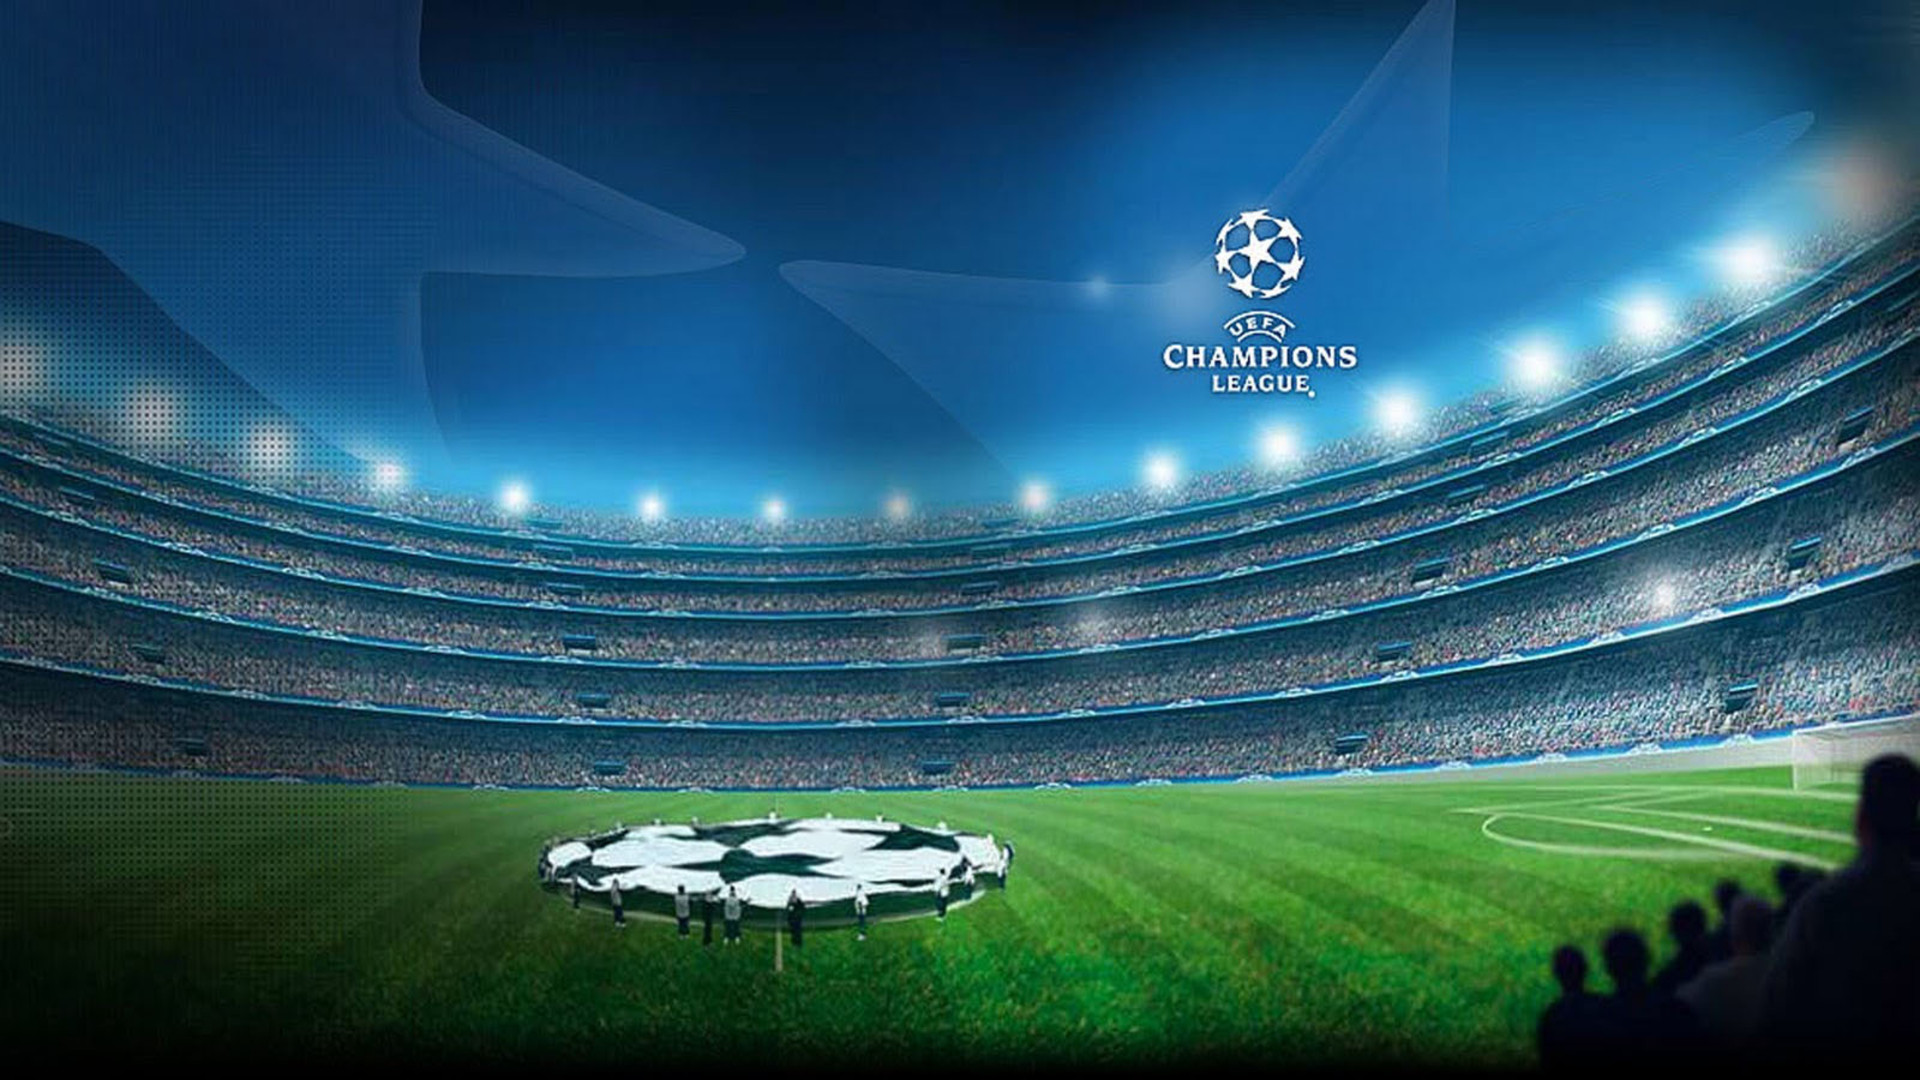 Res: 1920x1080, Uefa Champions League Logo 2014